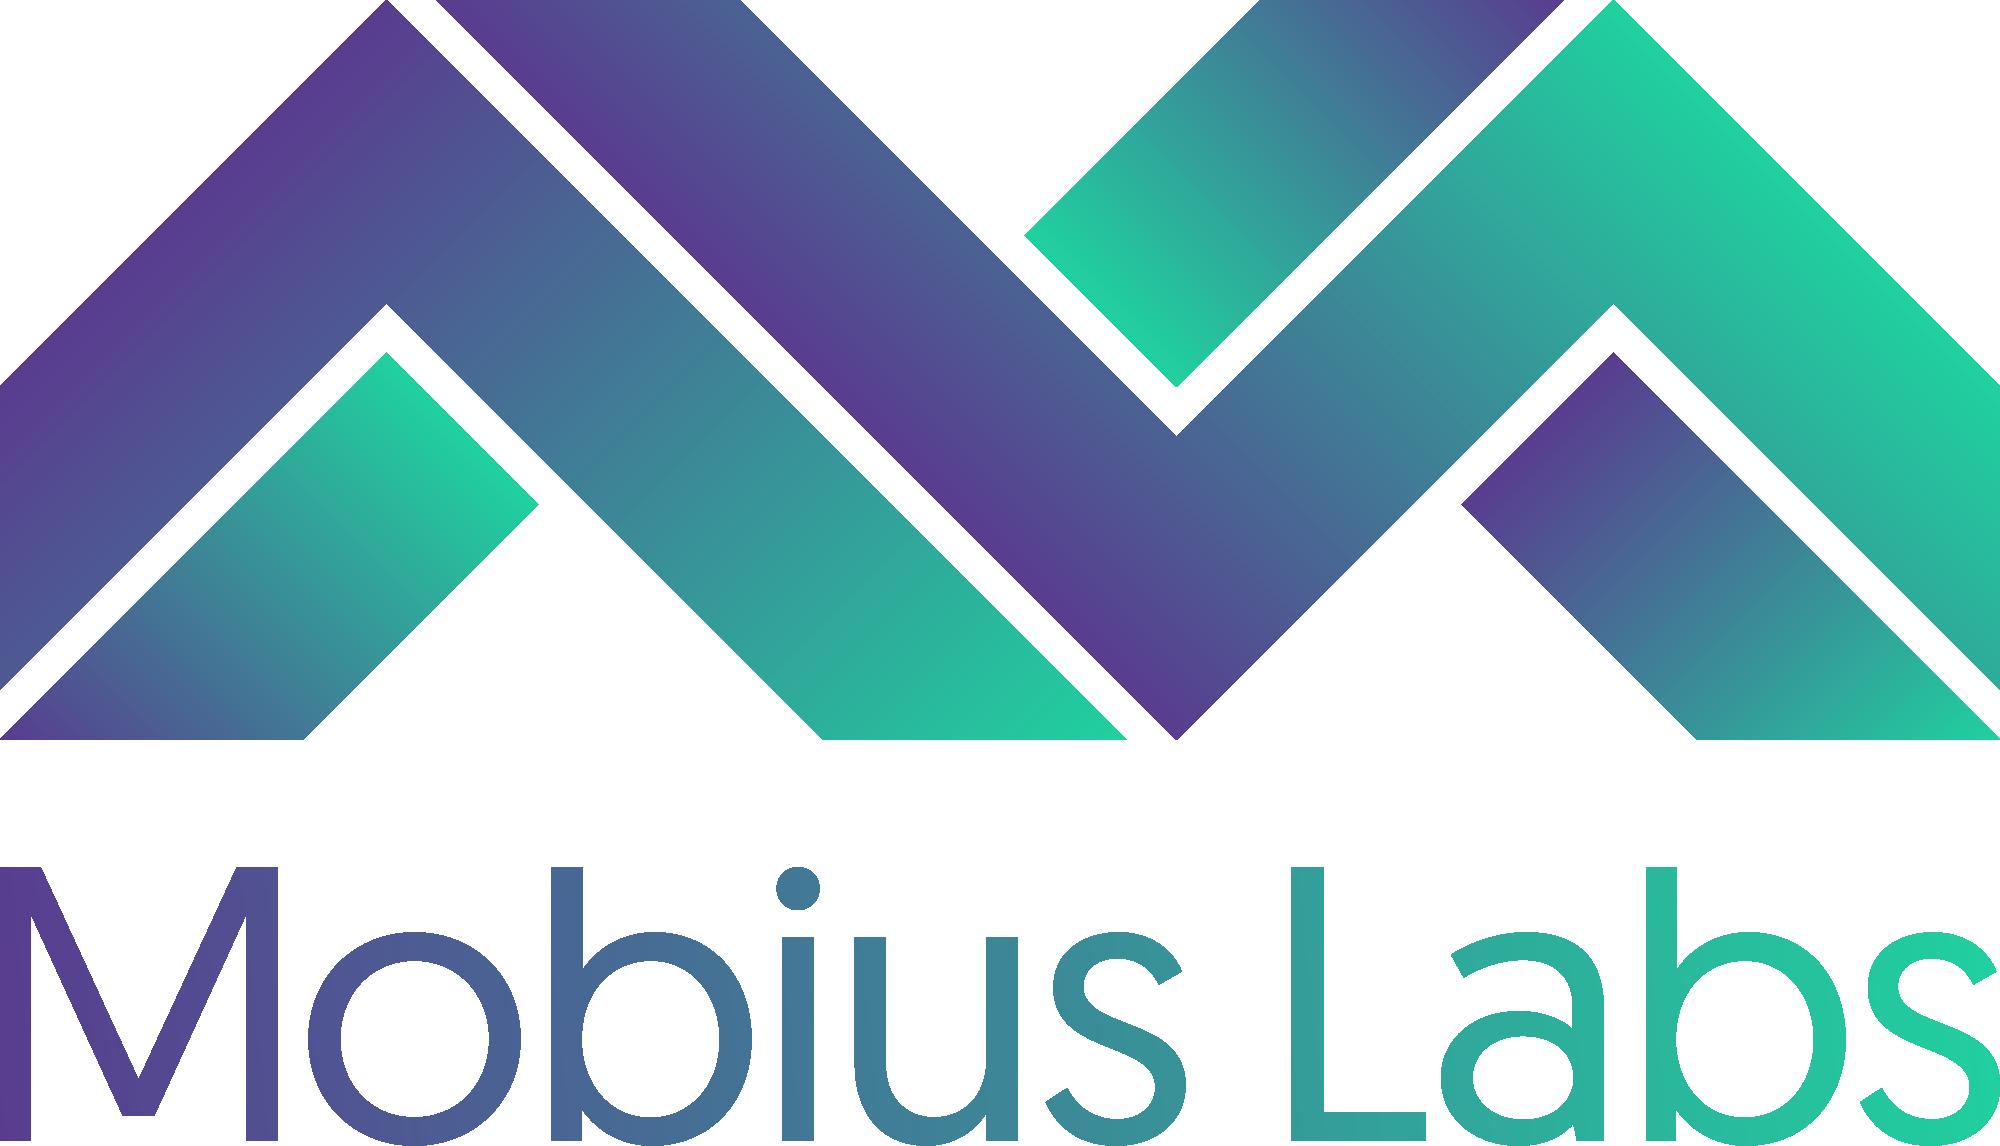 Mobius_labs_logo_Vertical_#593C8F to #20D19F - Fulya Lisa Neubert.png